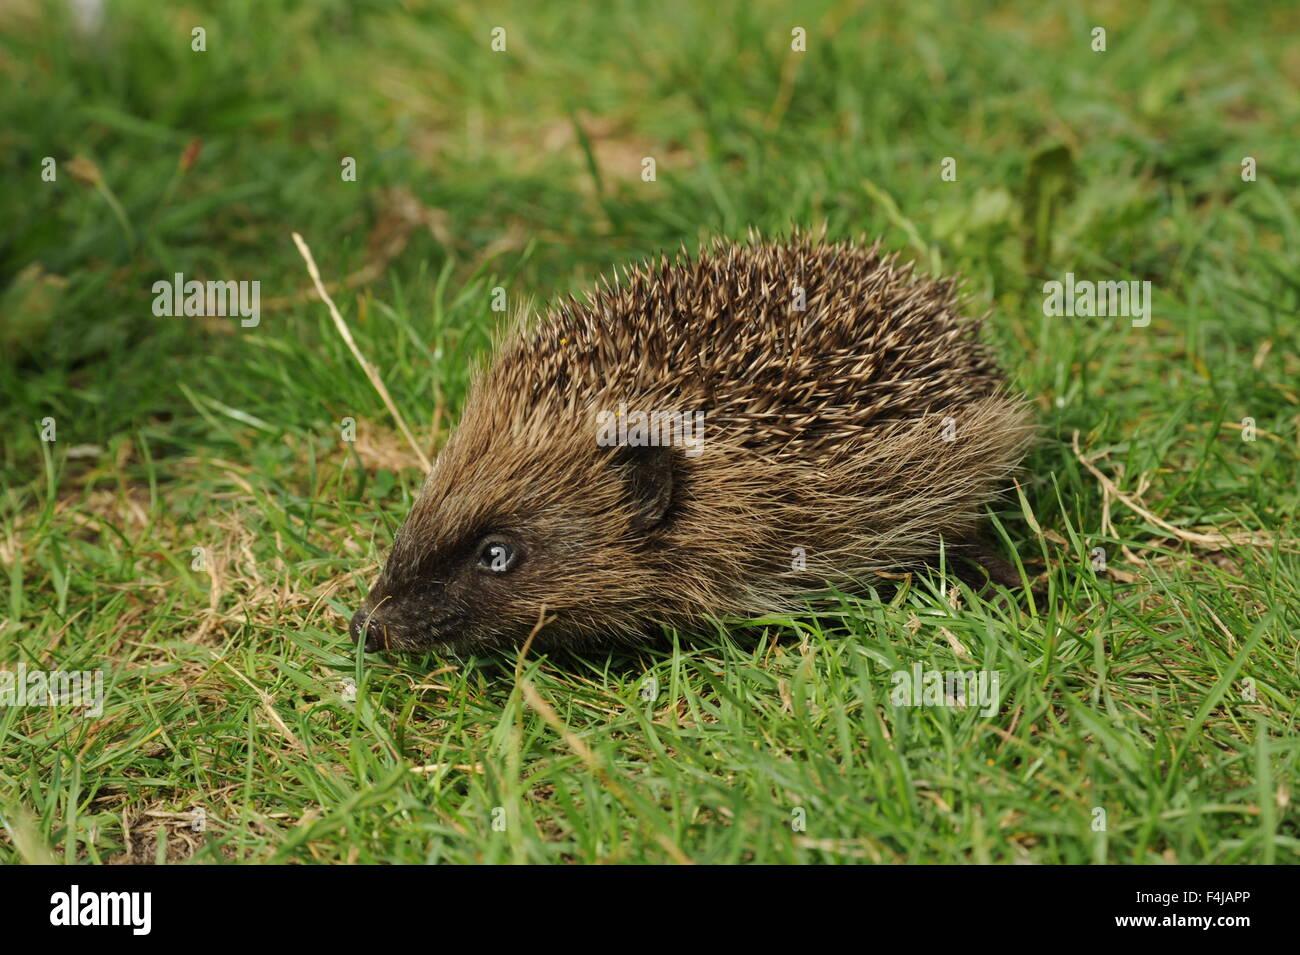 Hedgehog in grass - Stock Image